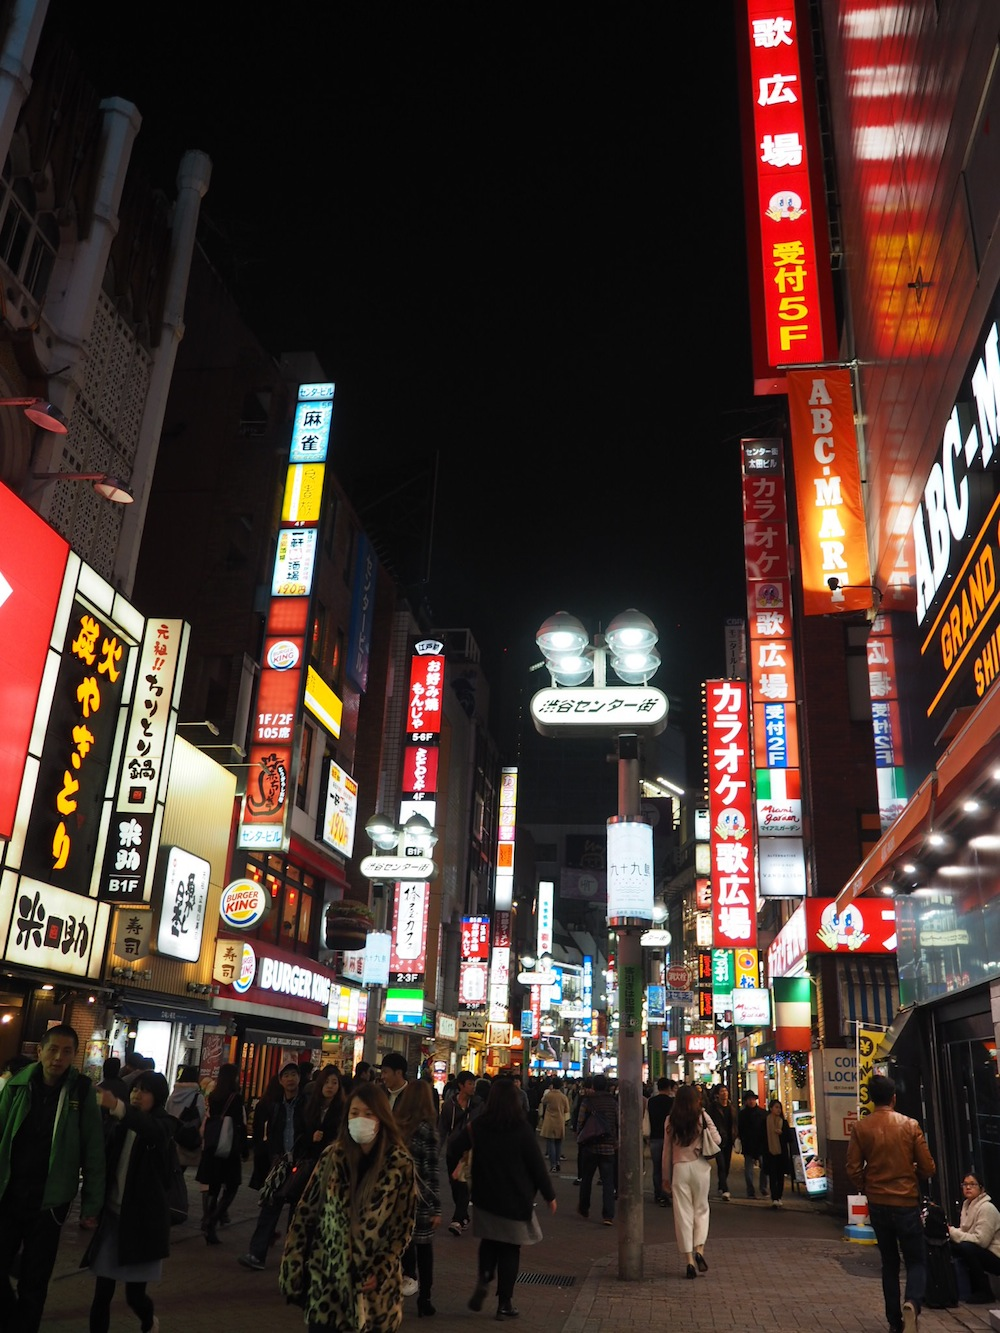 Late night shopping in Shibuya